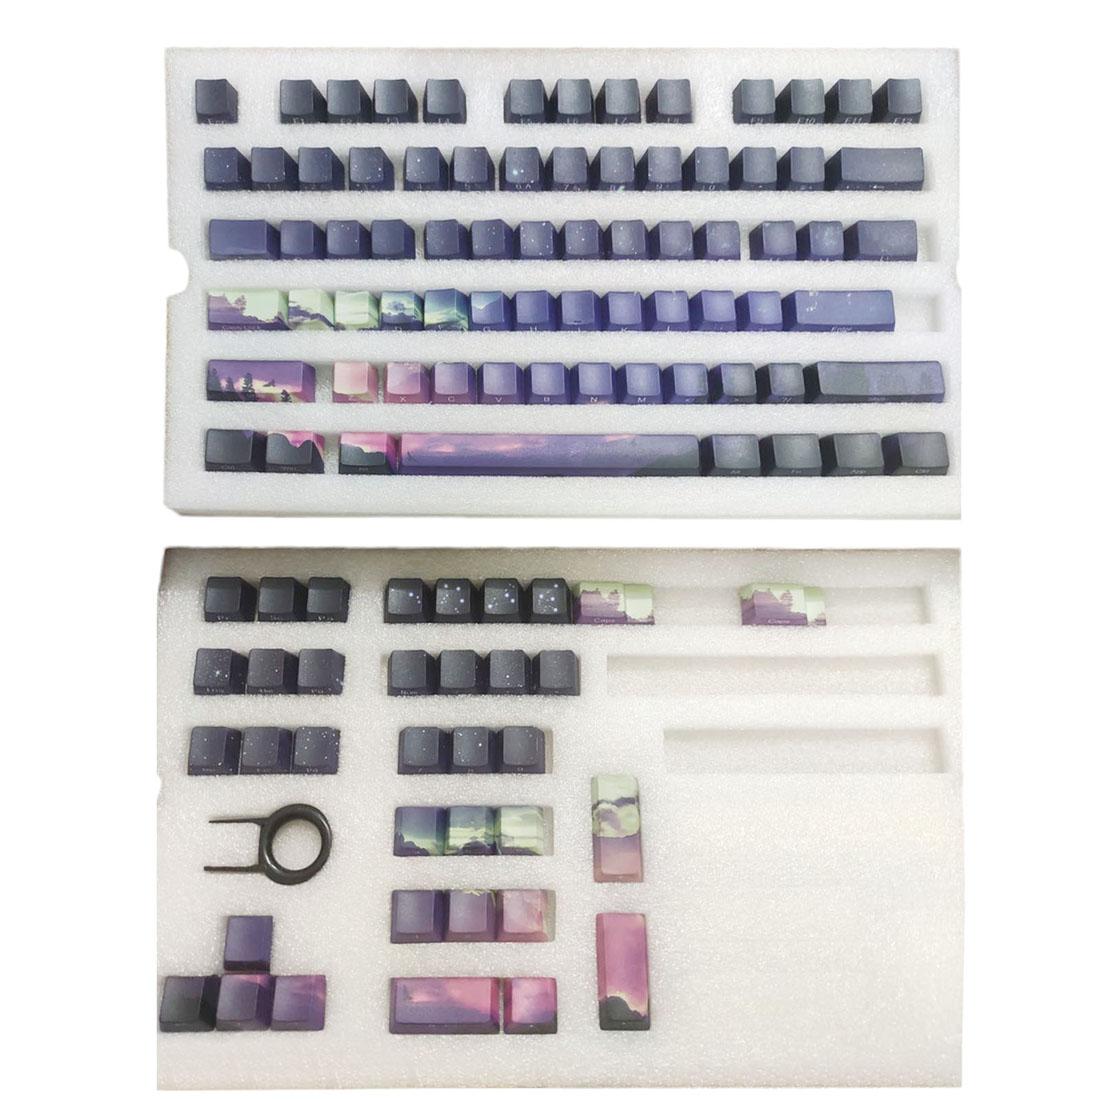 110pcs Dawn Style Keycaps Set PBT Dye-sub with Puller for 61/64/87/96/104 Keys GH60 RK61 Matrix Joke Custom Mechanical Gaming Keyboard